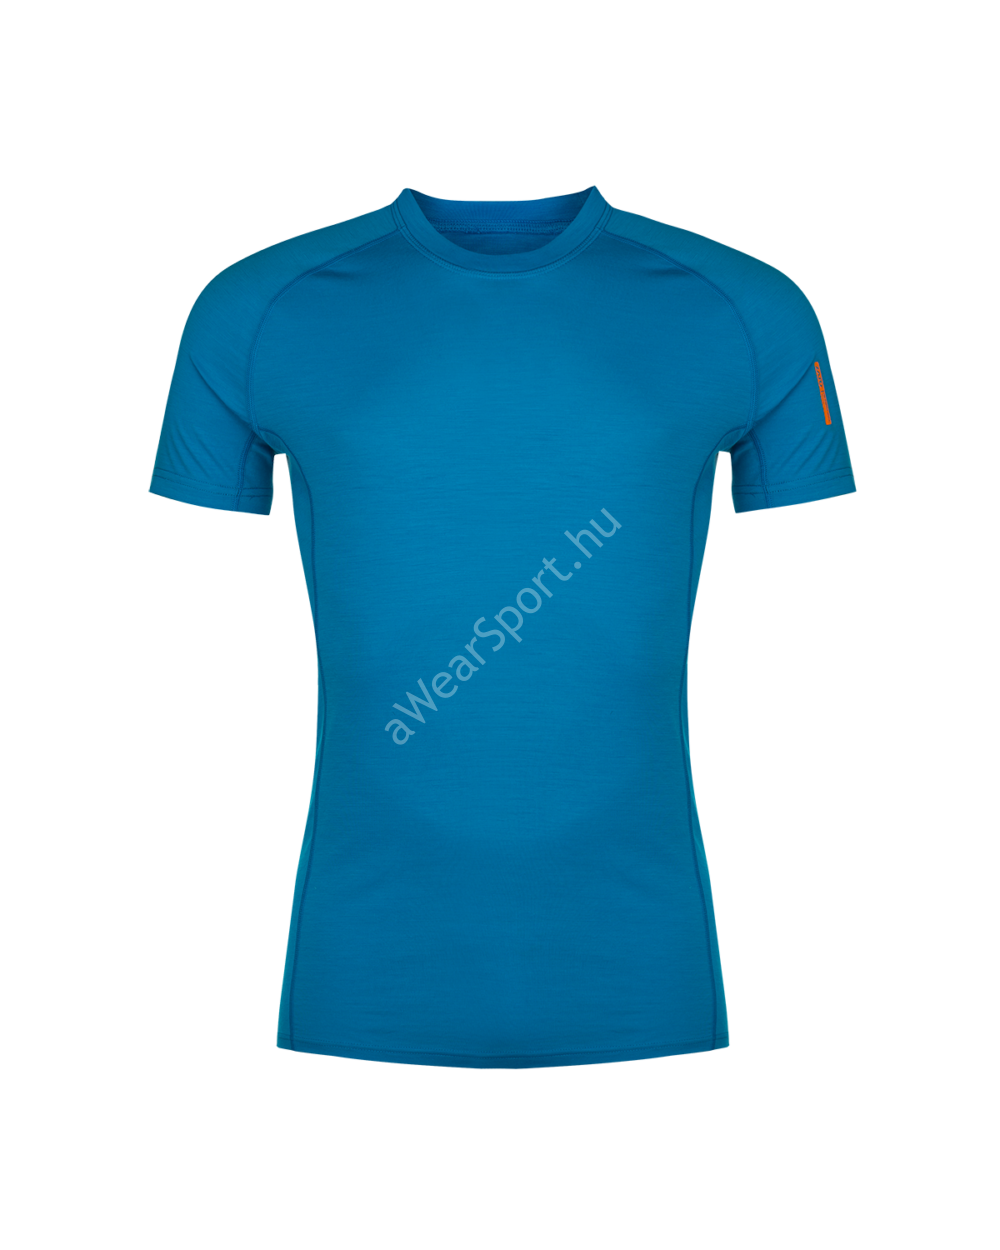 Zajo Bjorn Merino Tshirt SS férfi merinói gyapjú aláöltözet felső, greek blue